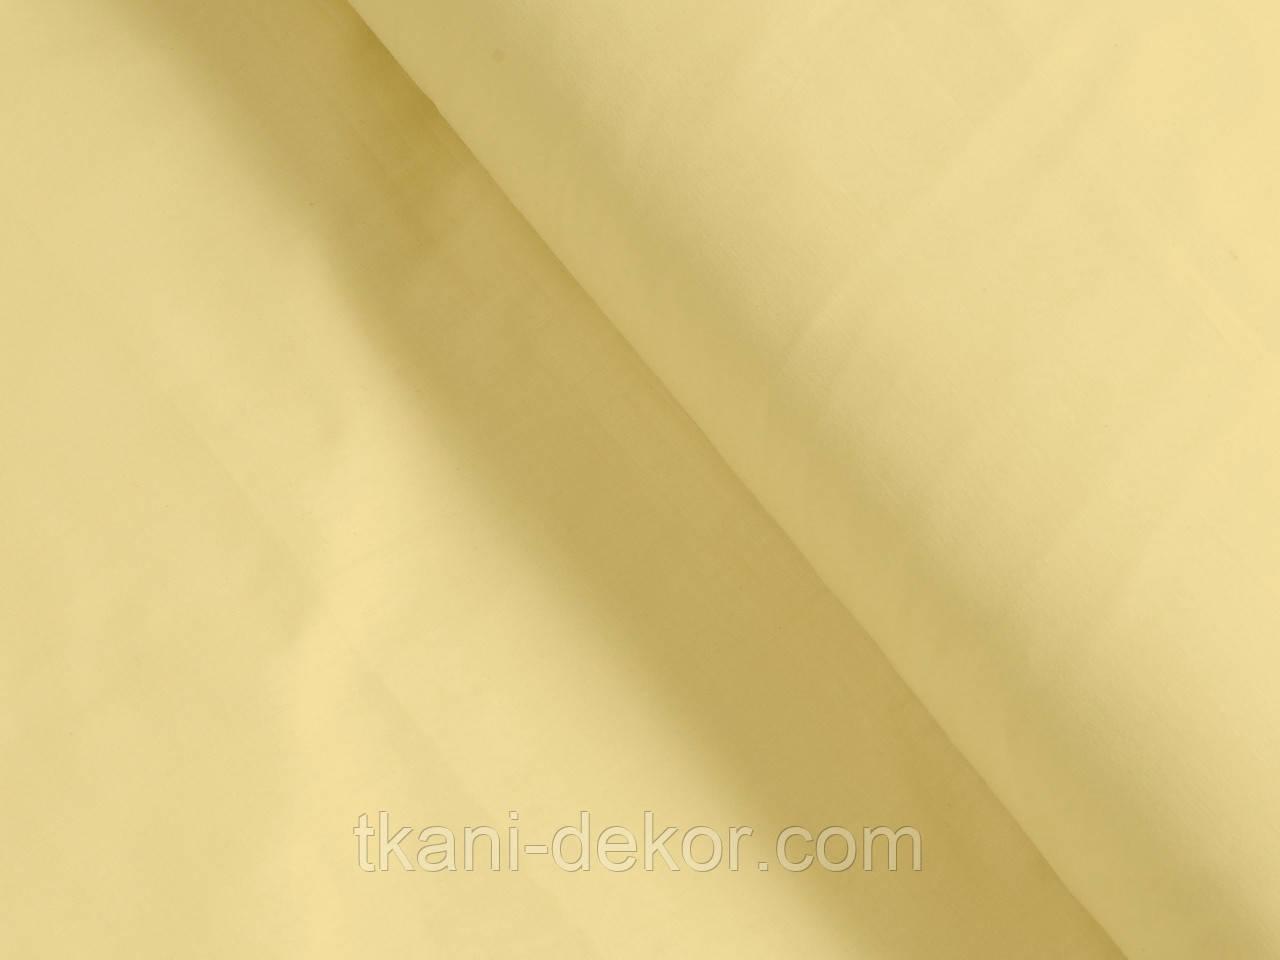 Сатин (хлопковая ткань) бежевый однотонный